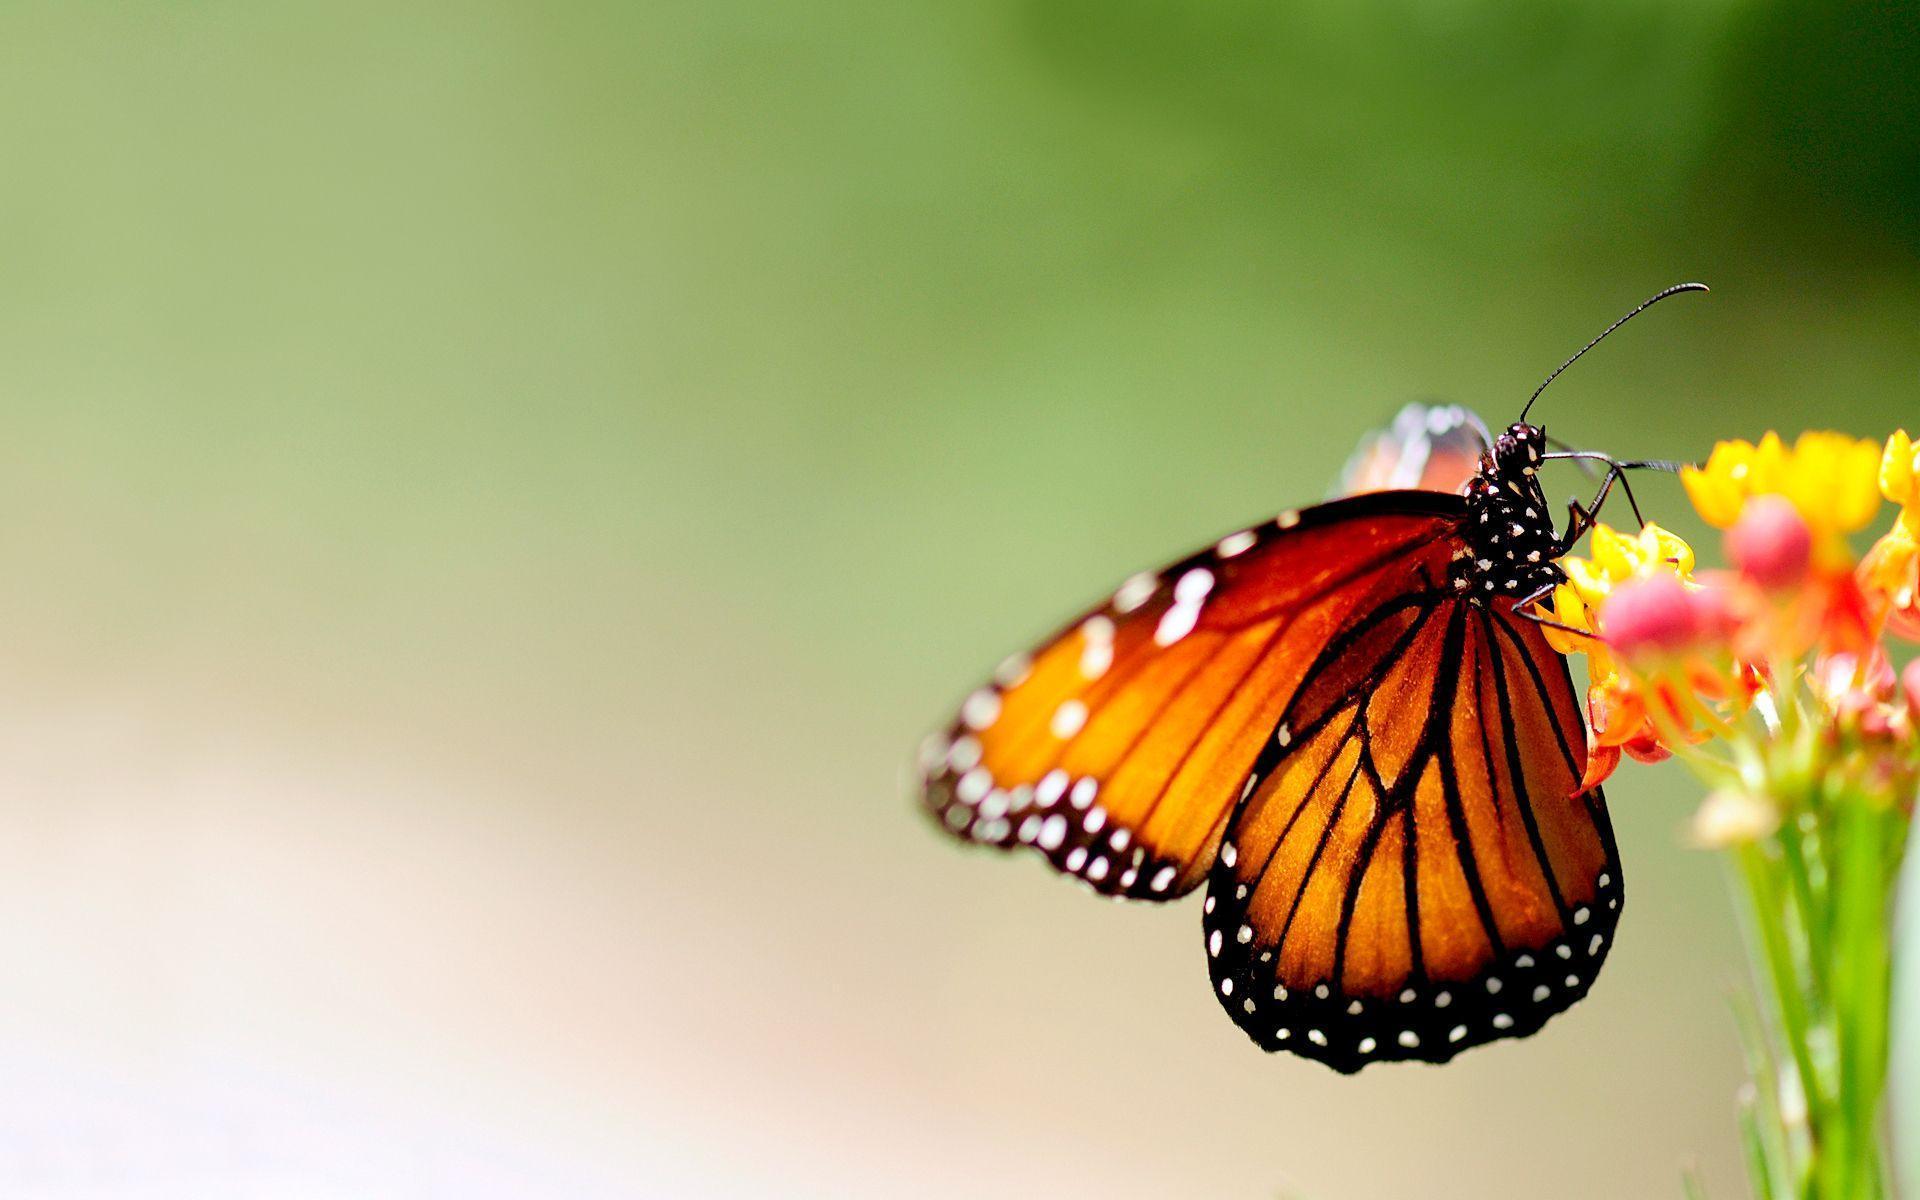 Butterfly Wallpaper Background - WallpaperSafari